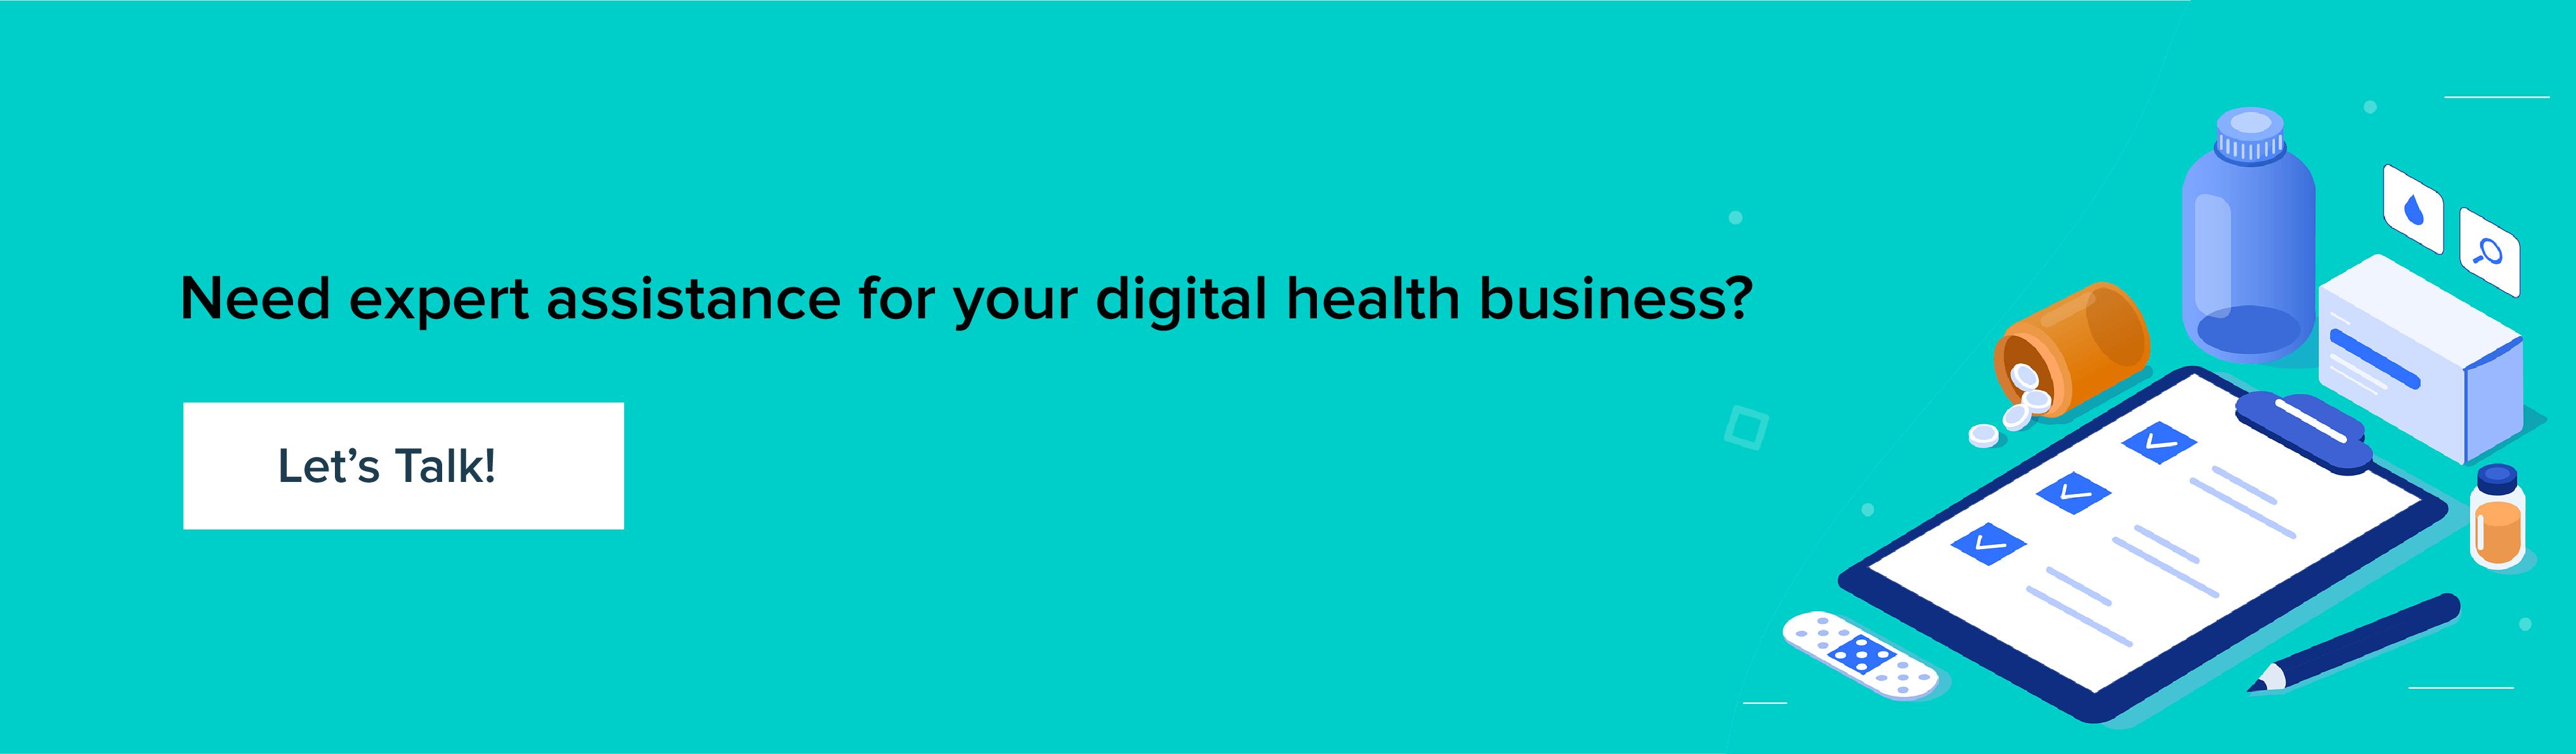 expert assistance for digital health business